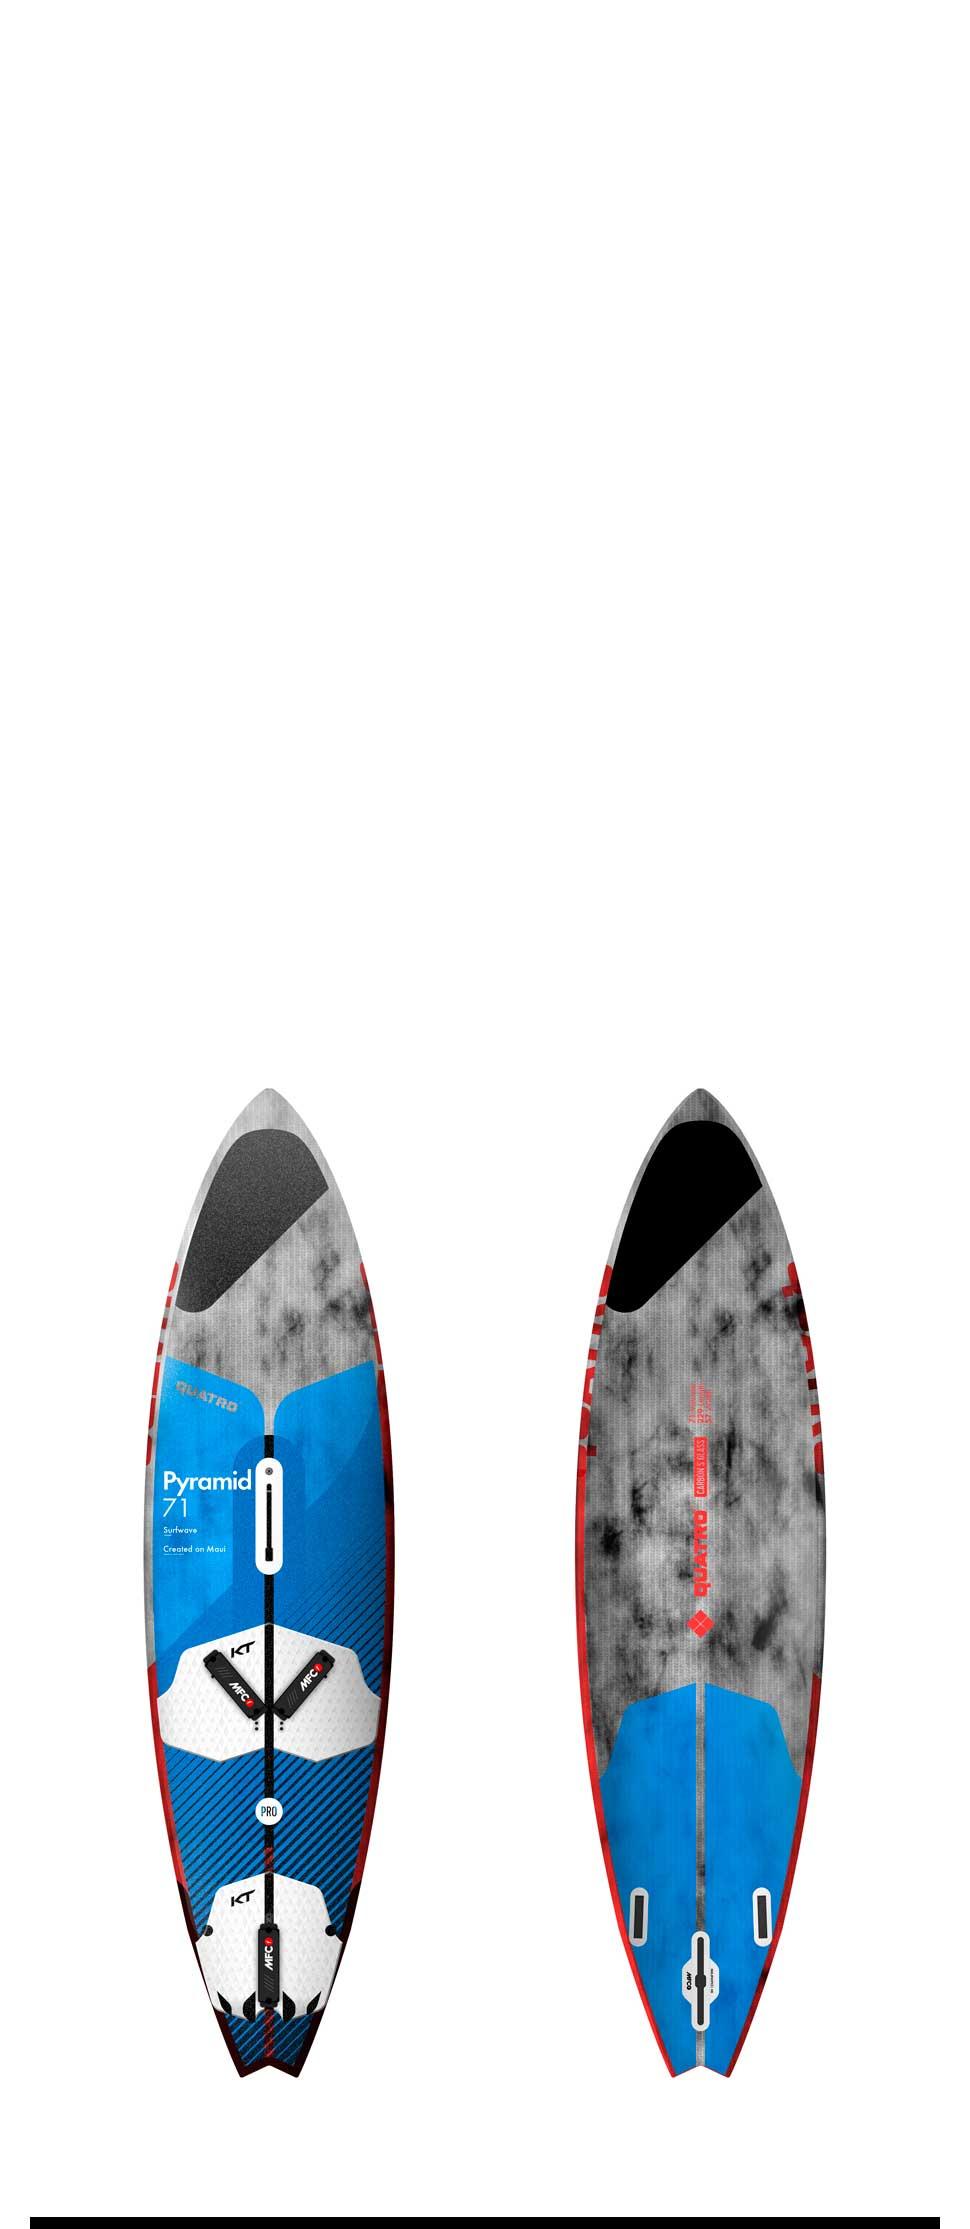 Quatro Windsurfing - Boards - Windsurfing